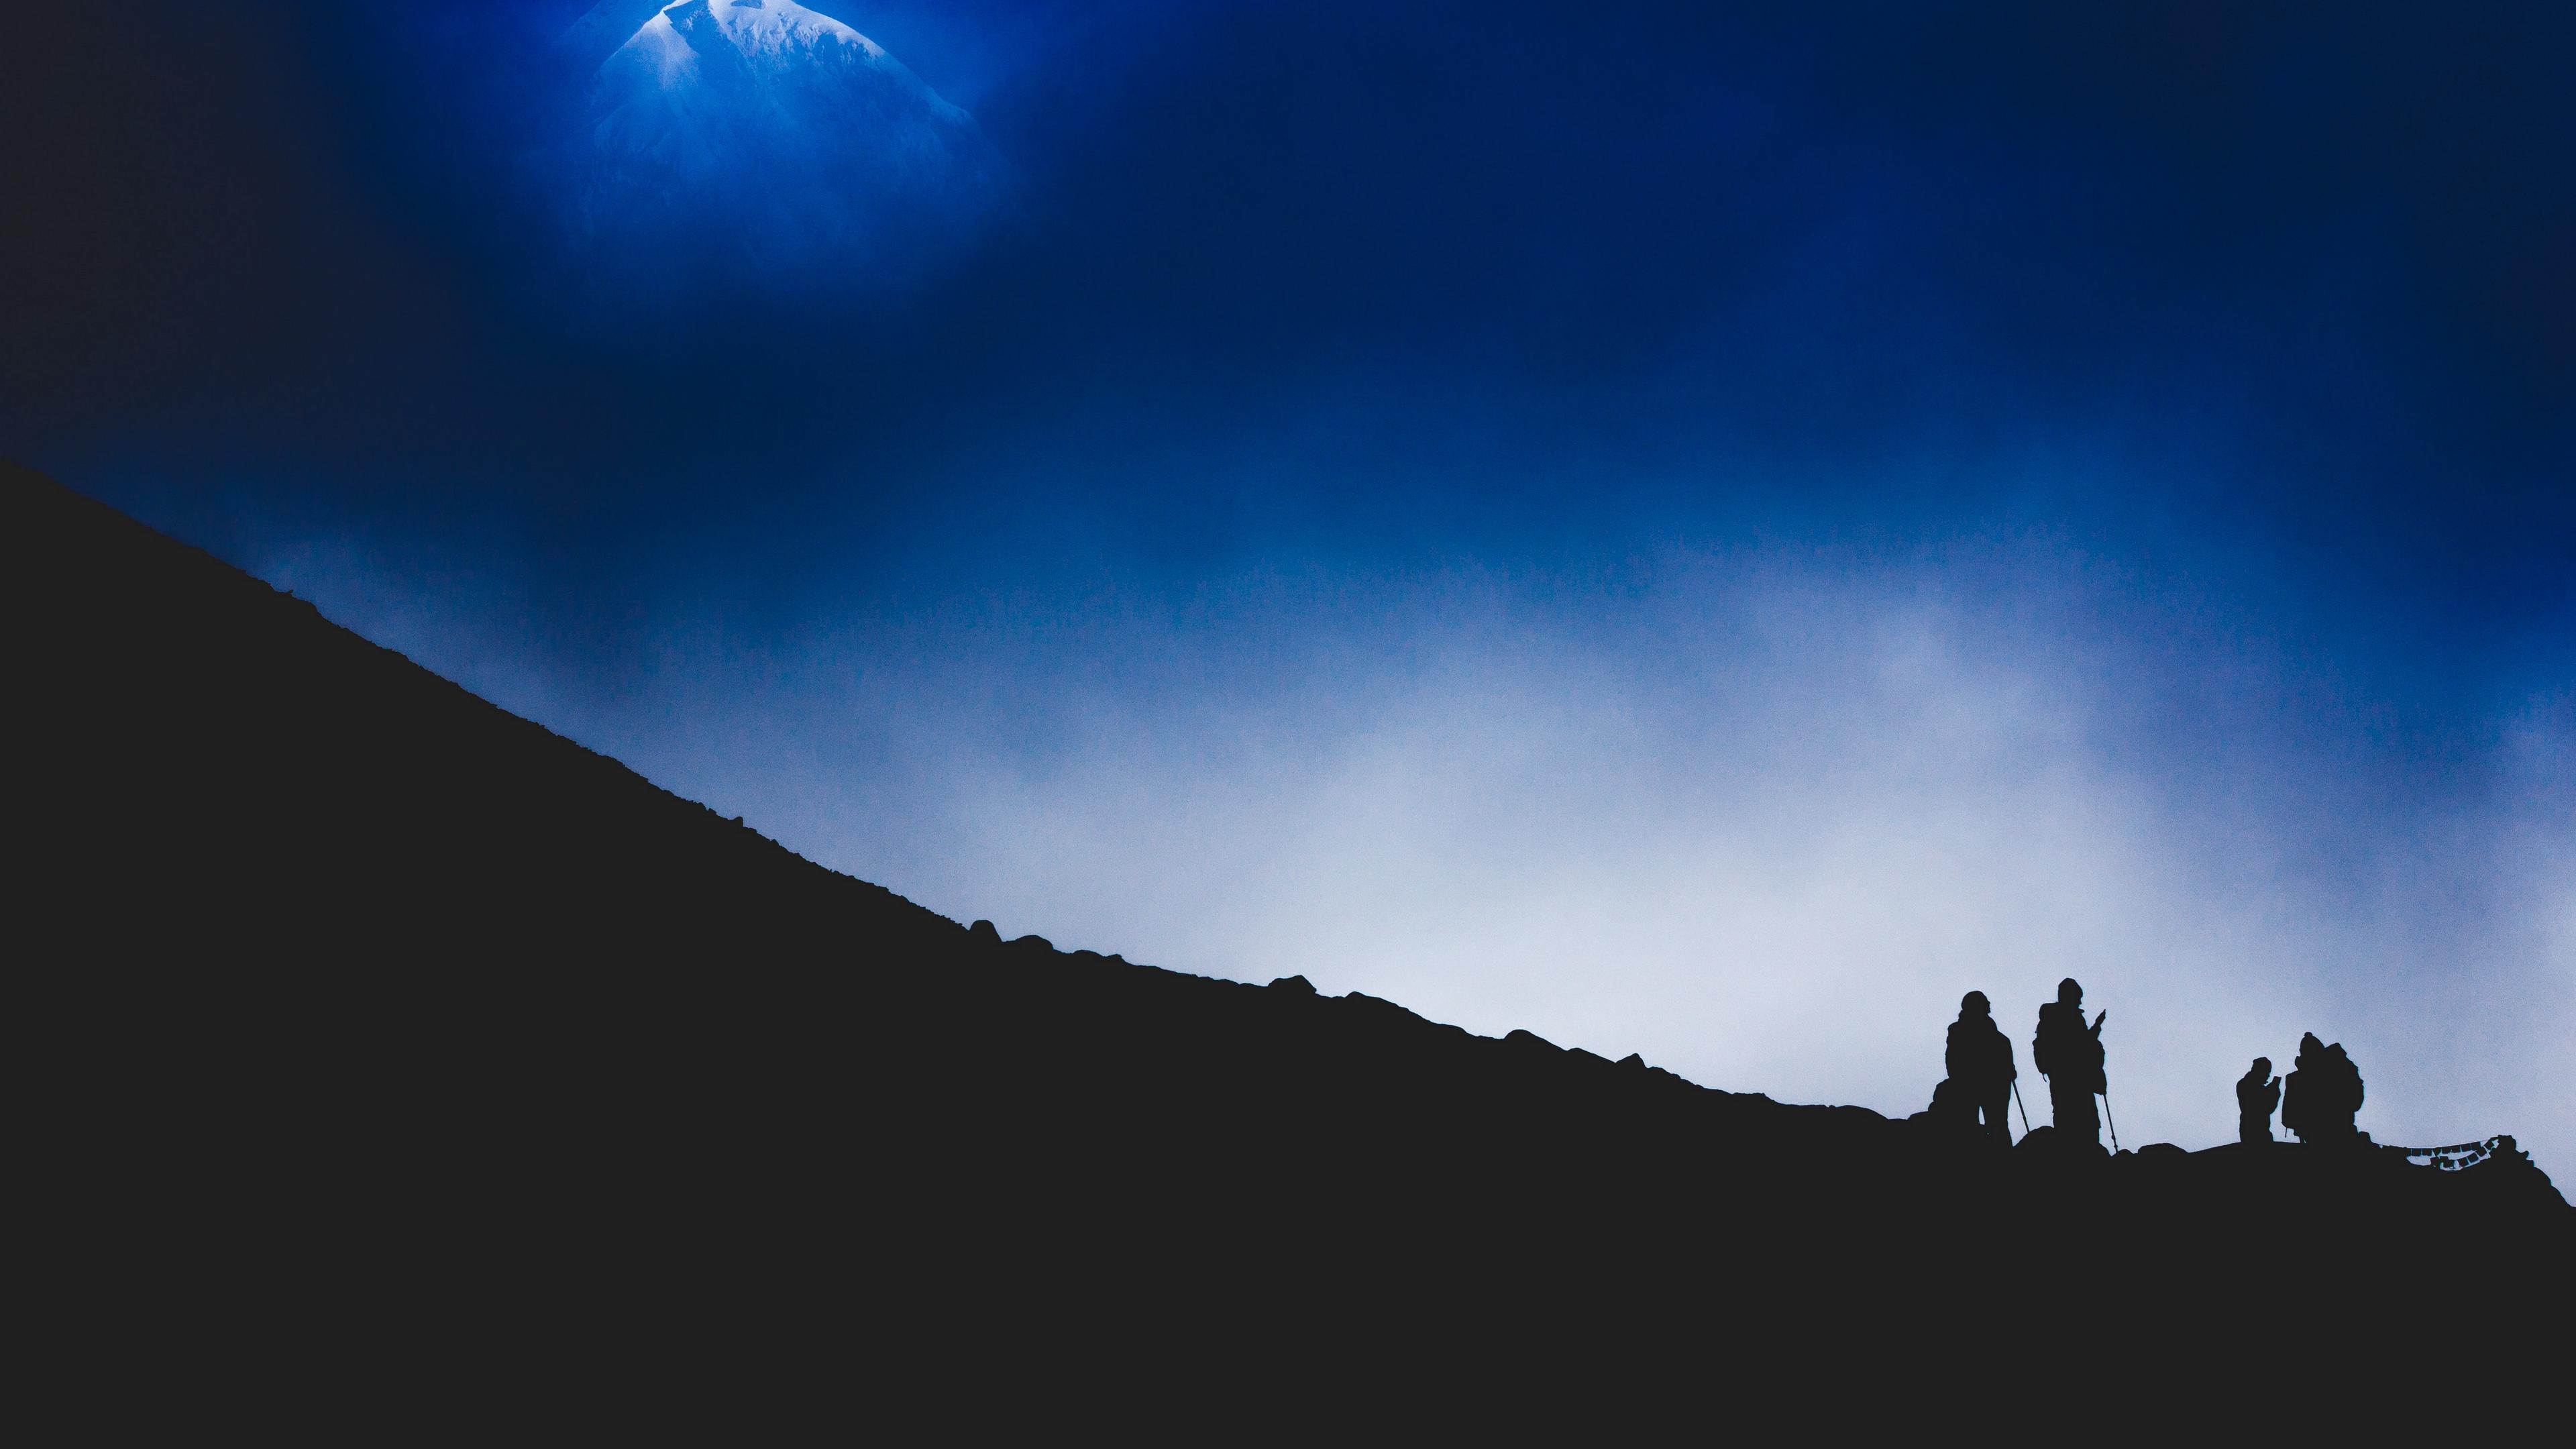 mountain silhouette night tourists mountaineers 4k 1540575047 - mountain, silhouette, night, tourists, mountaineers 4k - Silhouette, Night, Mountain